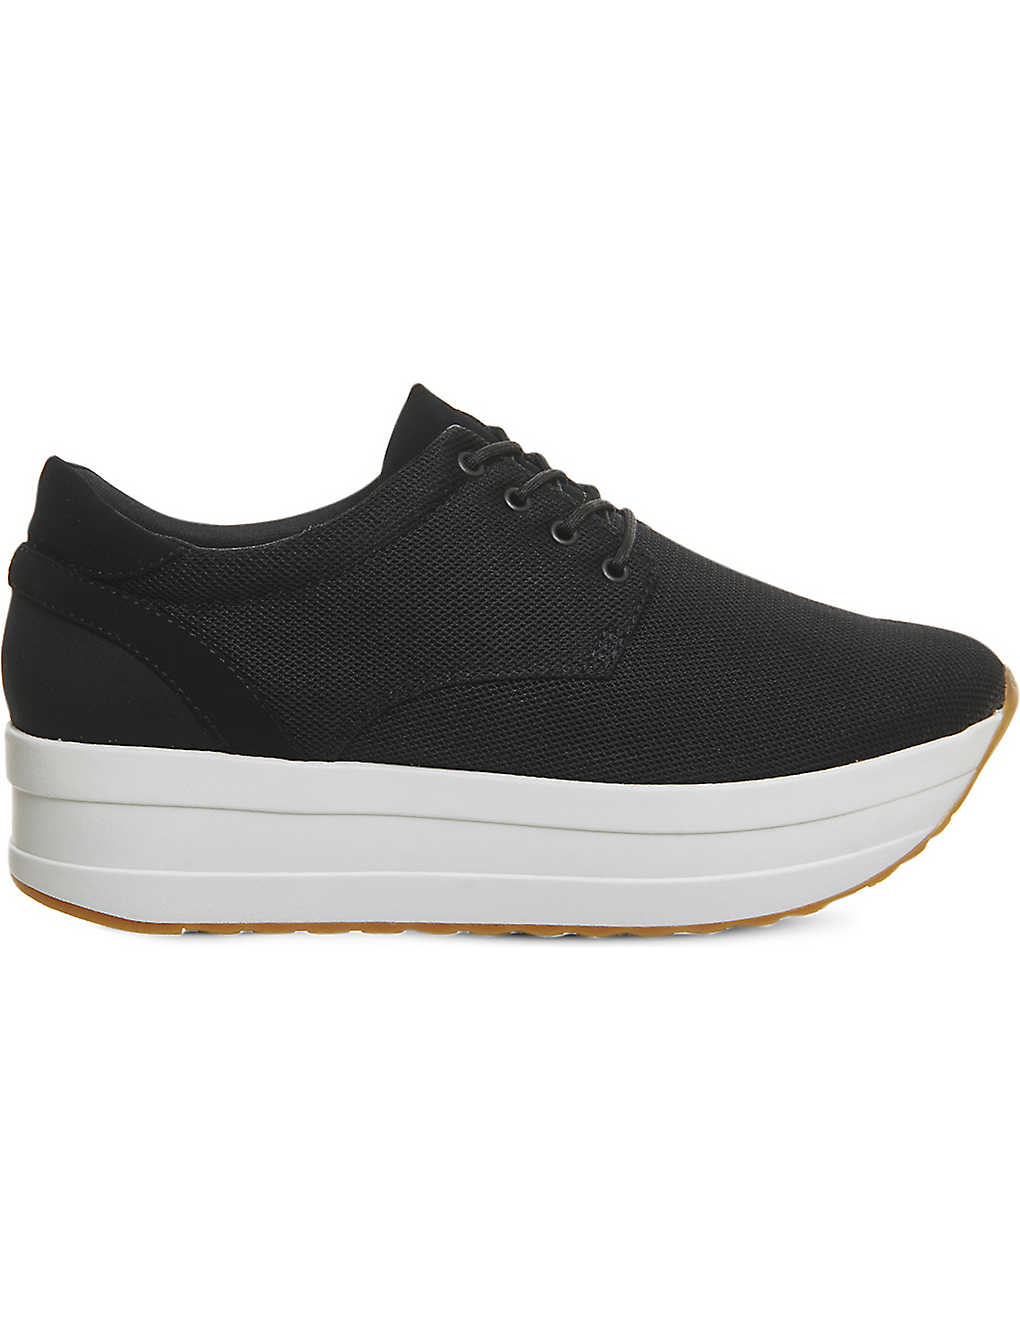 66f706d1bda VAGABOND - Casey flatform textile sneakers